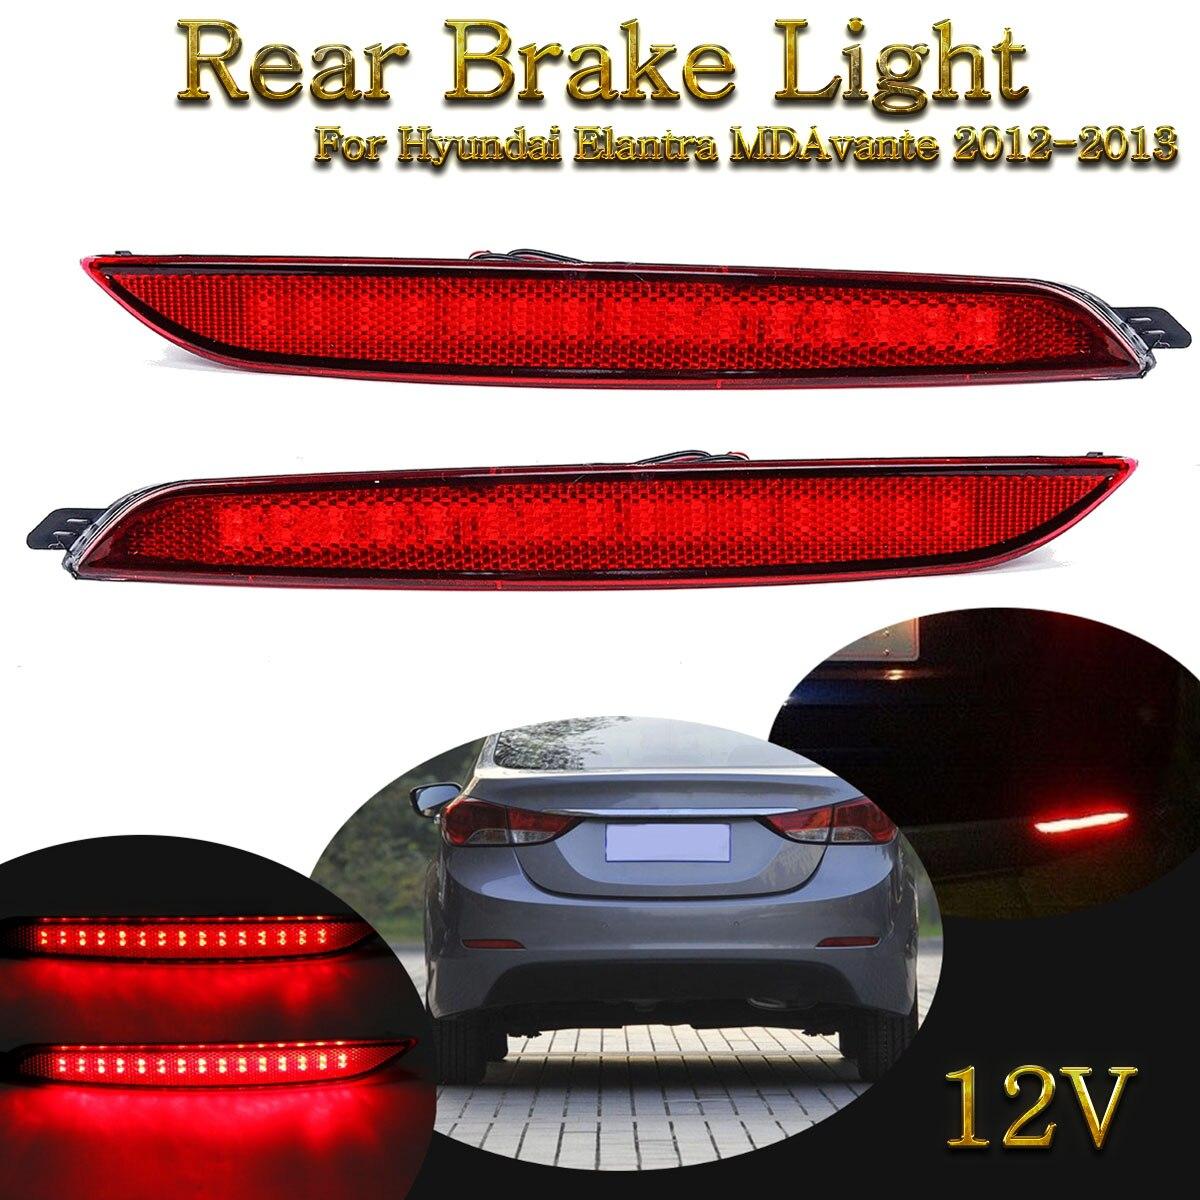 For Hyundai Elantra MDAvante 2012-13 1 Pair LED Rear Bumper Reflector Daytime Running Lights Brake Lights Rear Fog Lamps